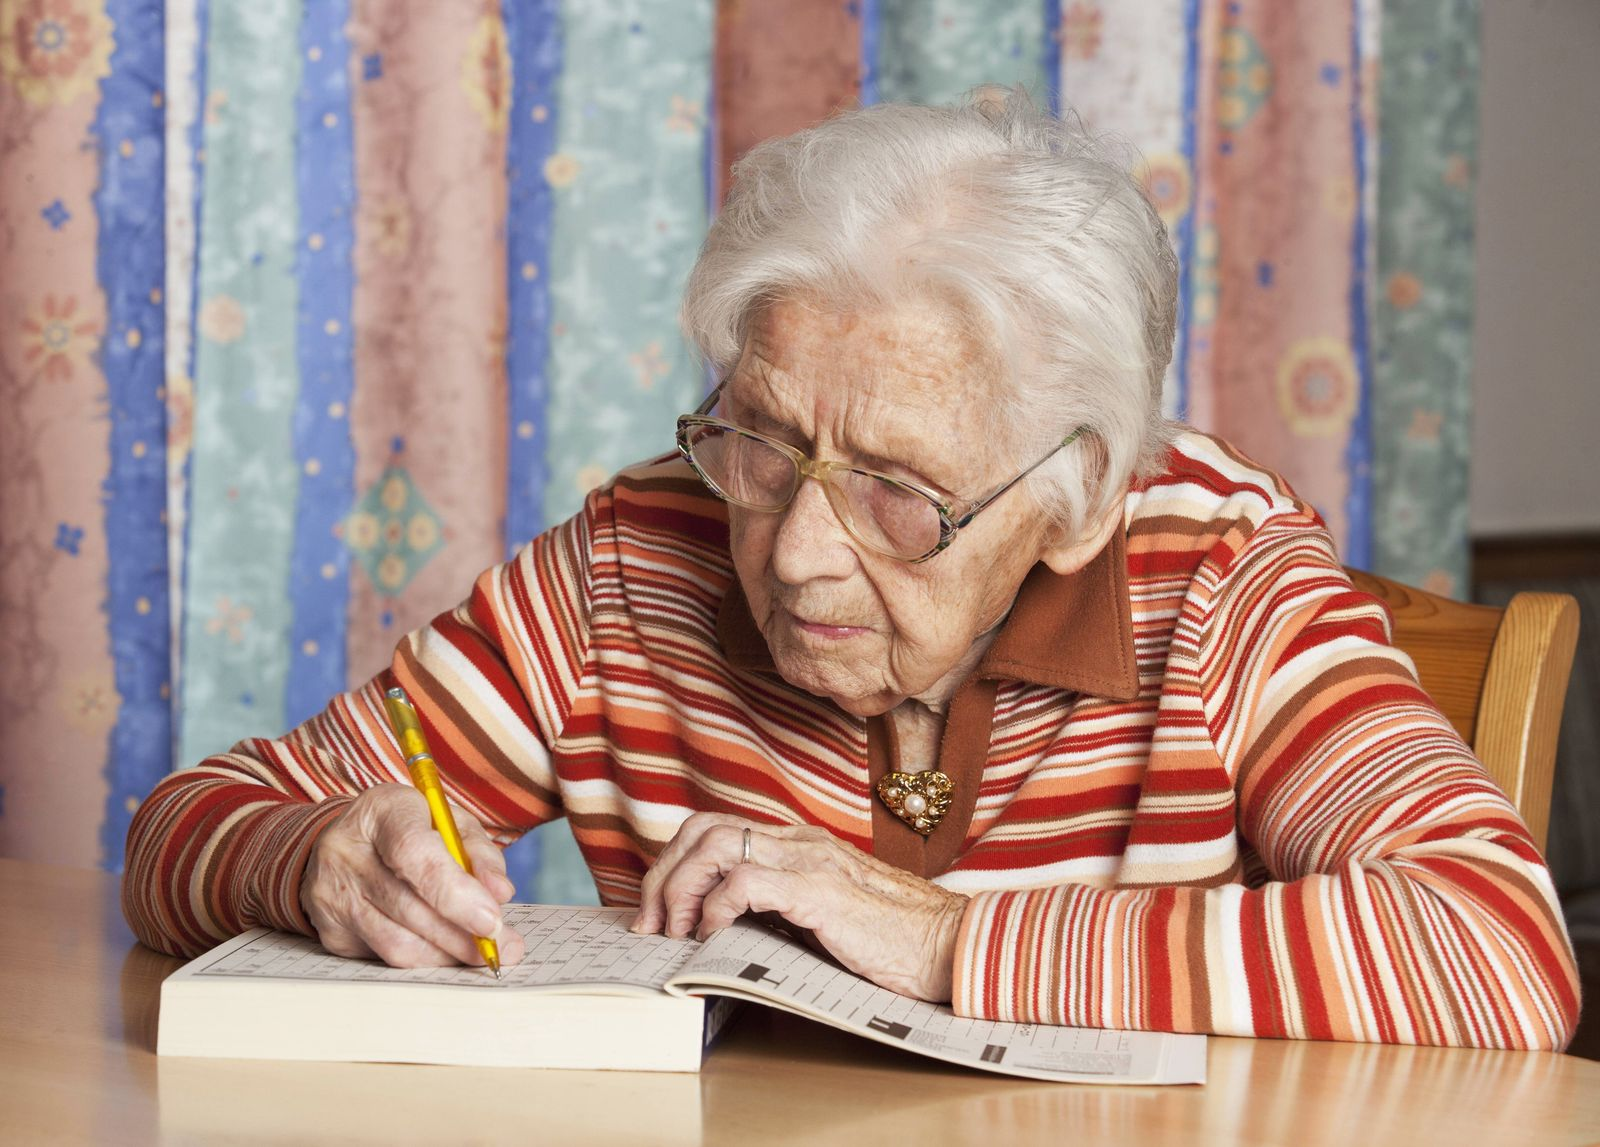 Portrait of senior woman with crossword puzzle model released Symbolfoto PUBLICATIONxINxGERxSUIxAUTx